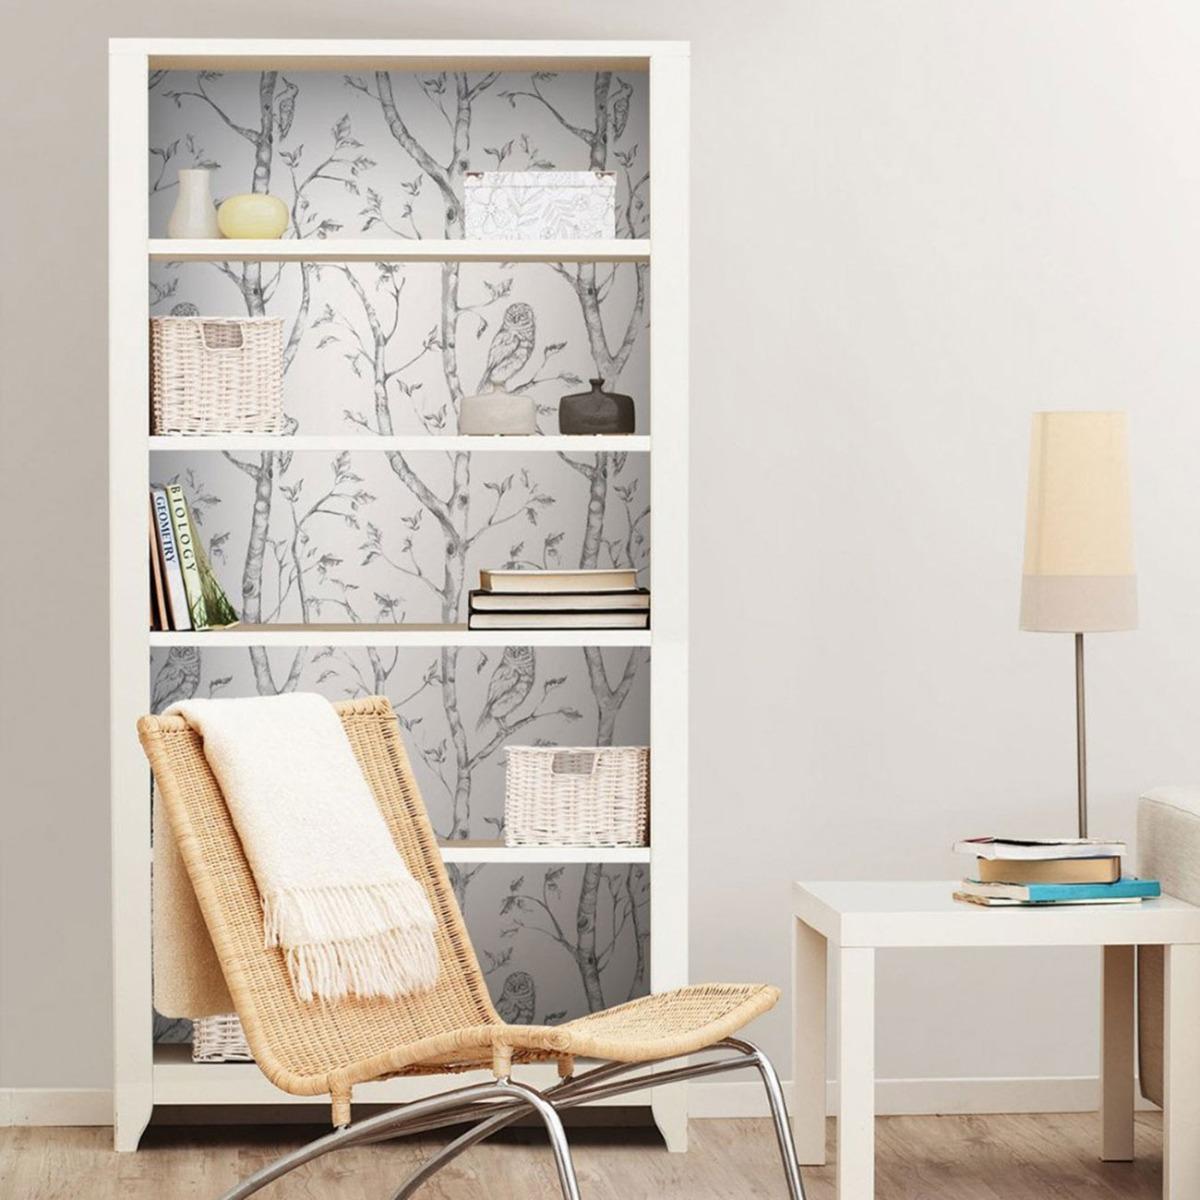 NuWallpaper Woods Peel And Stick Wallpaper Grey Fine Decor NU1412 5.5m x 0.52m